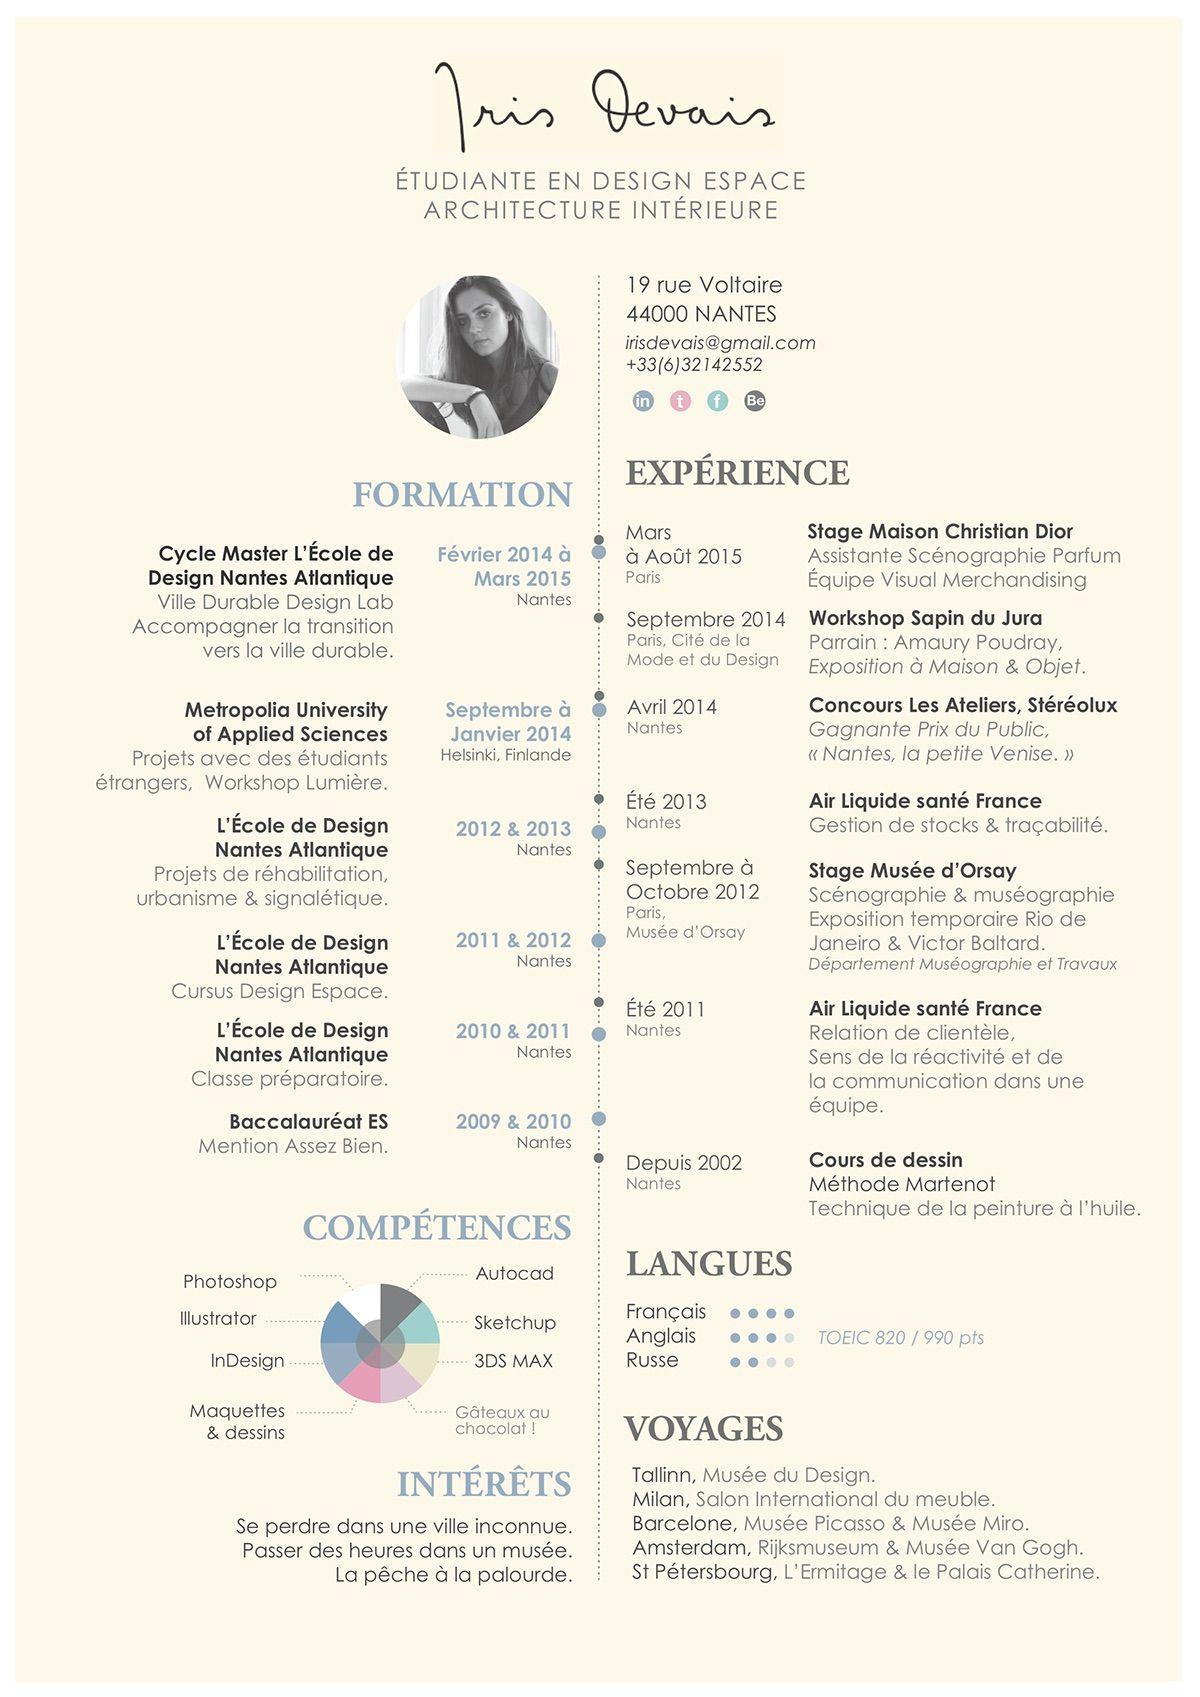 Curriculum Vitae On Behance Graphic Design Pinterest